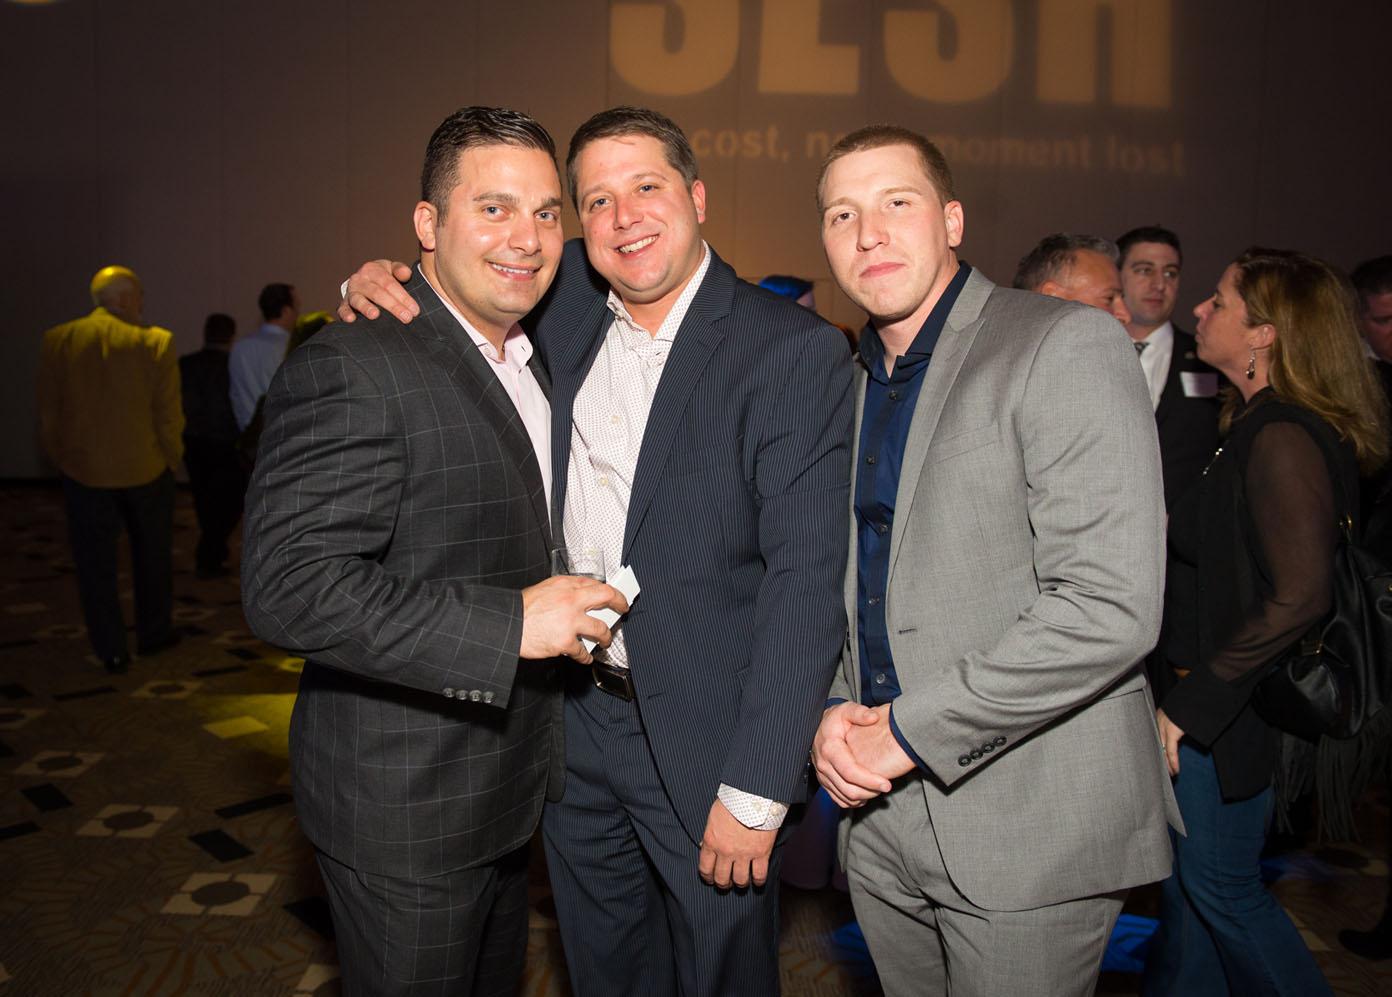 2015-12-09 ReMax Corpoarte Event - The Borgata - Atlantic City NJ - Photo Sesh - 2015-5048.jpg